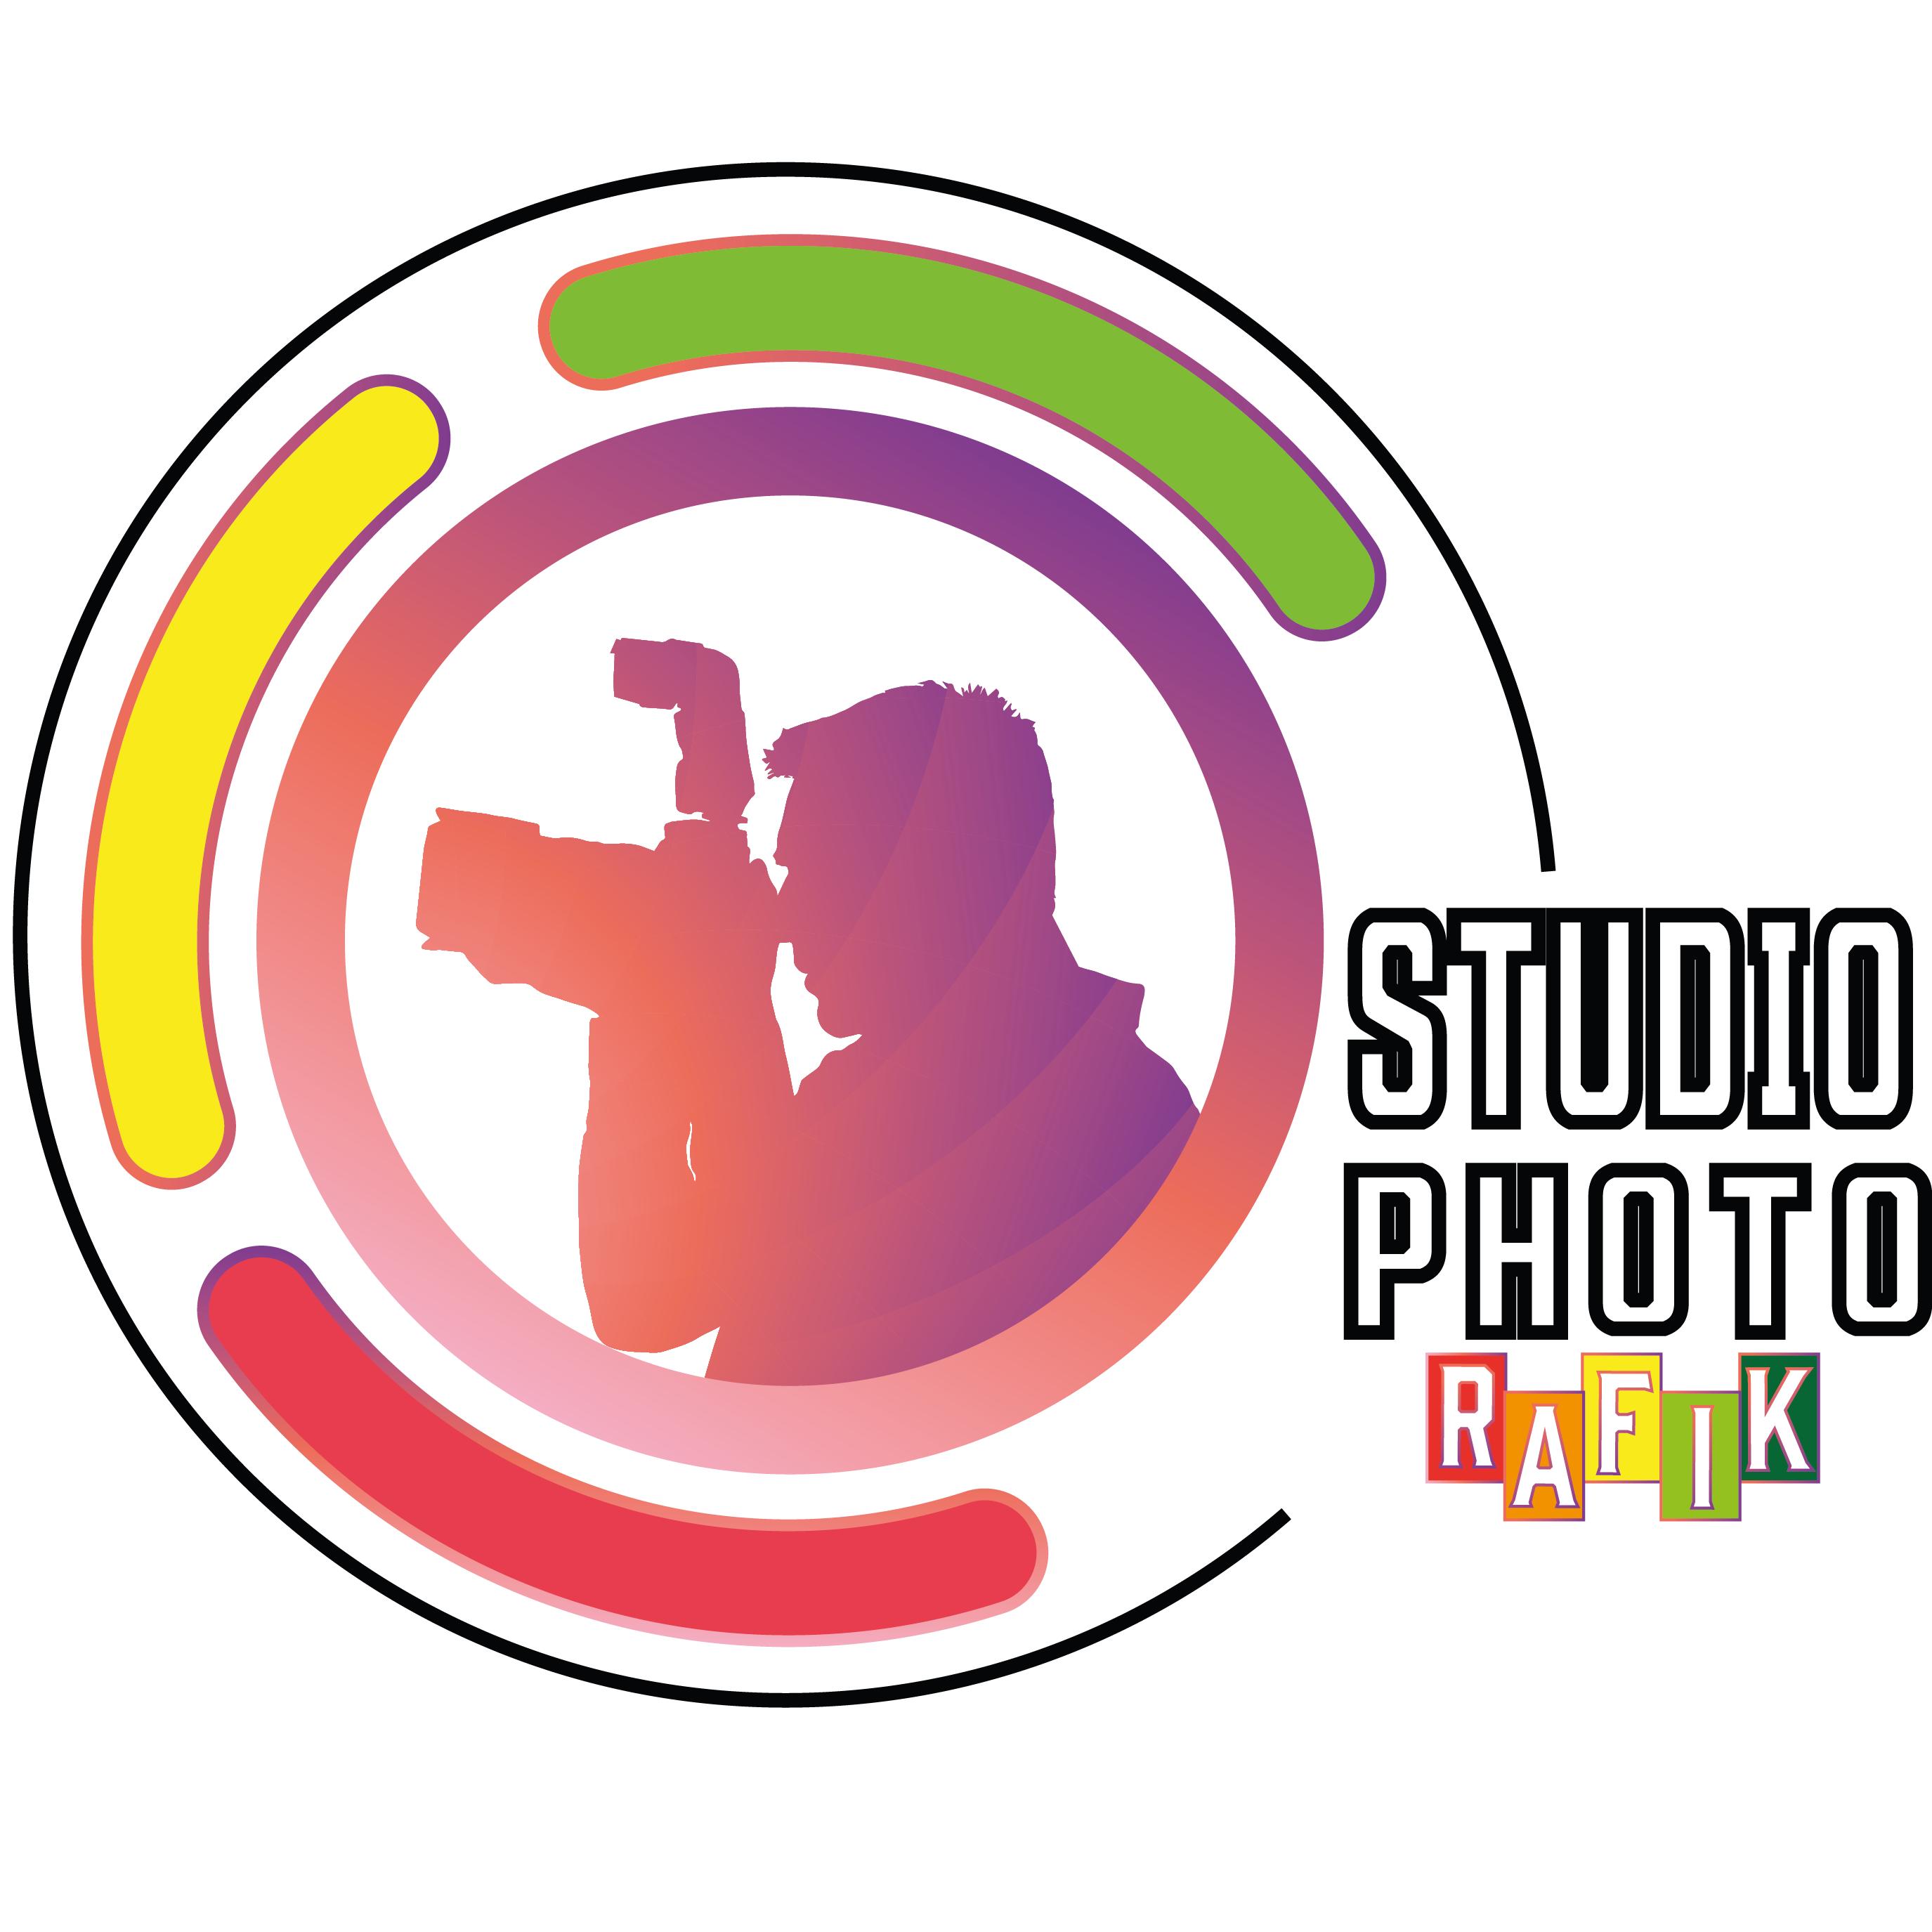 Studio Photo Rafik Collignon